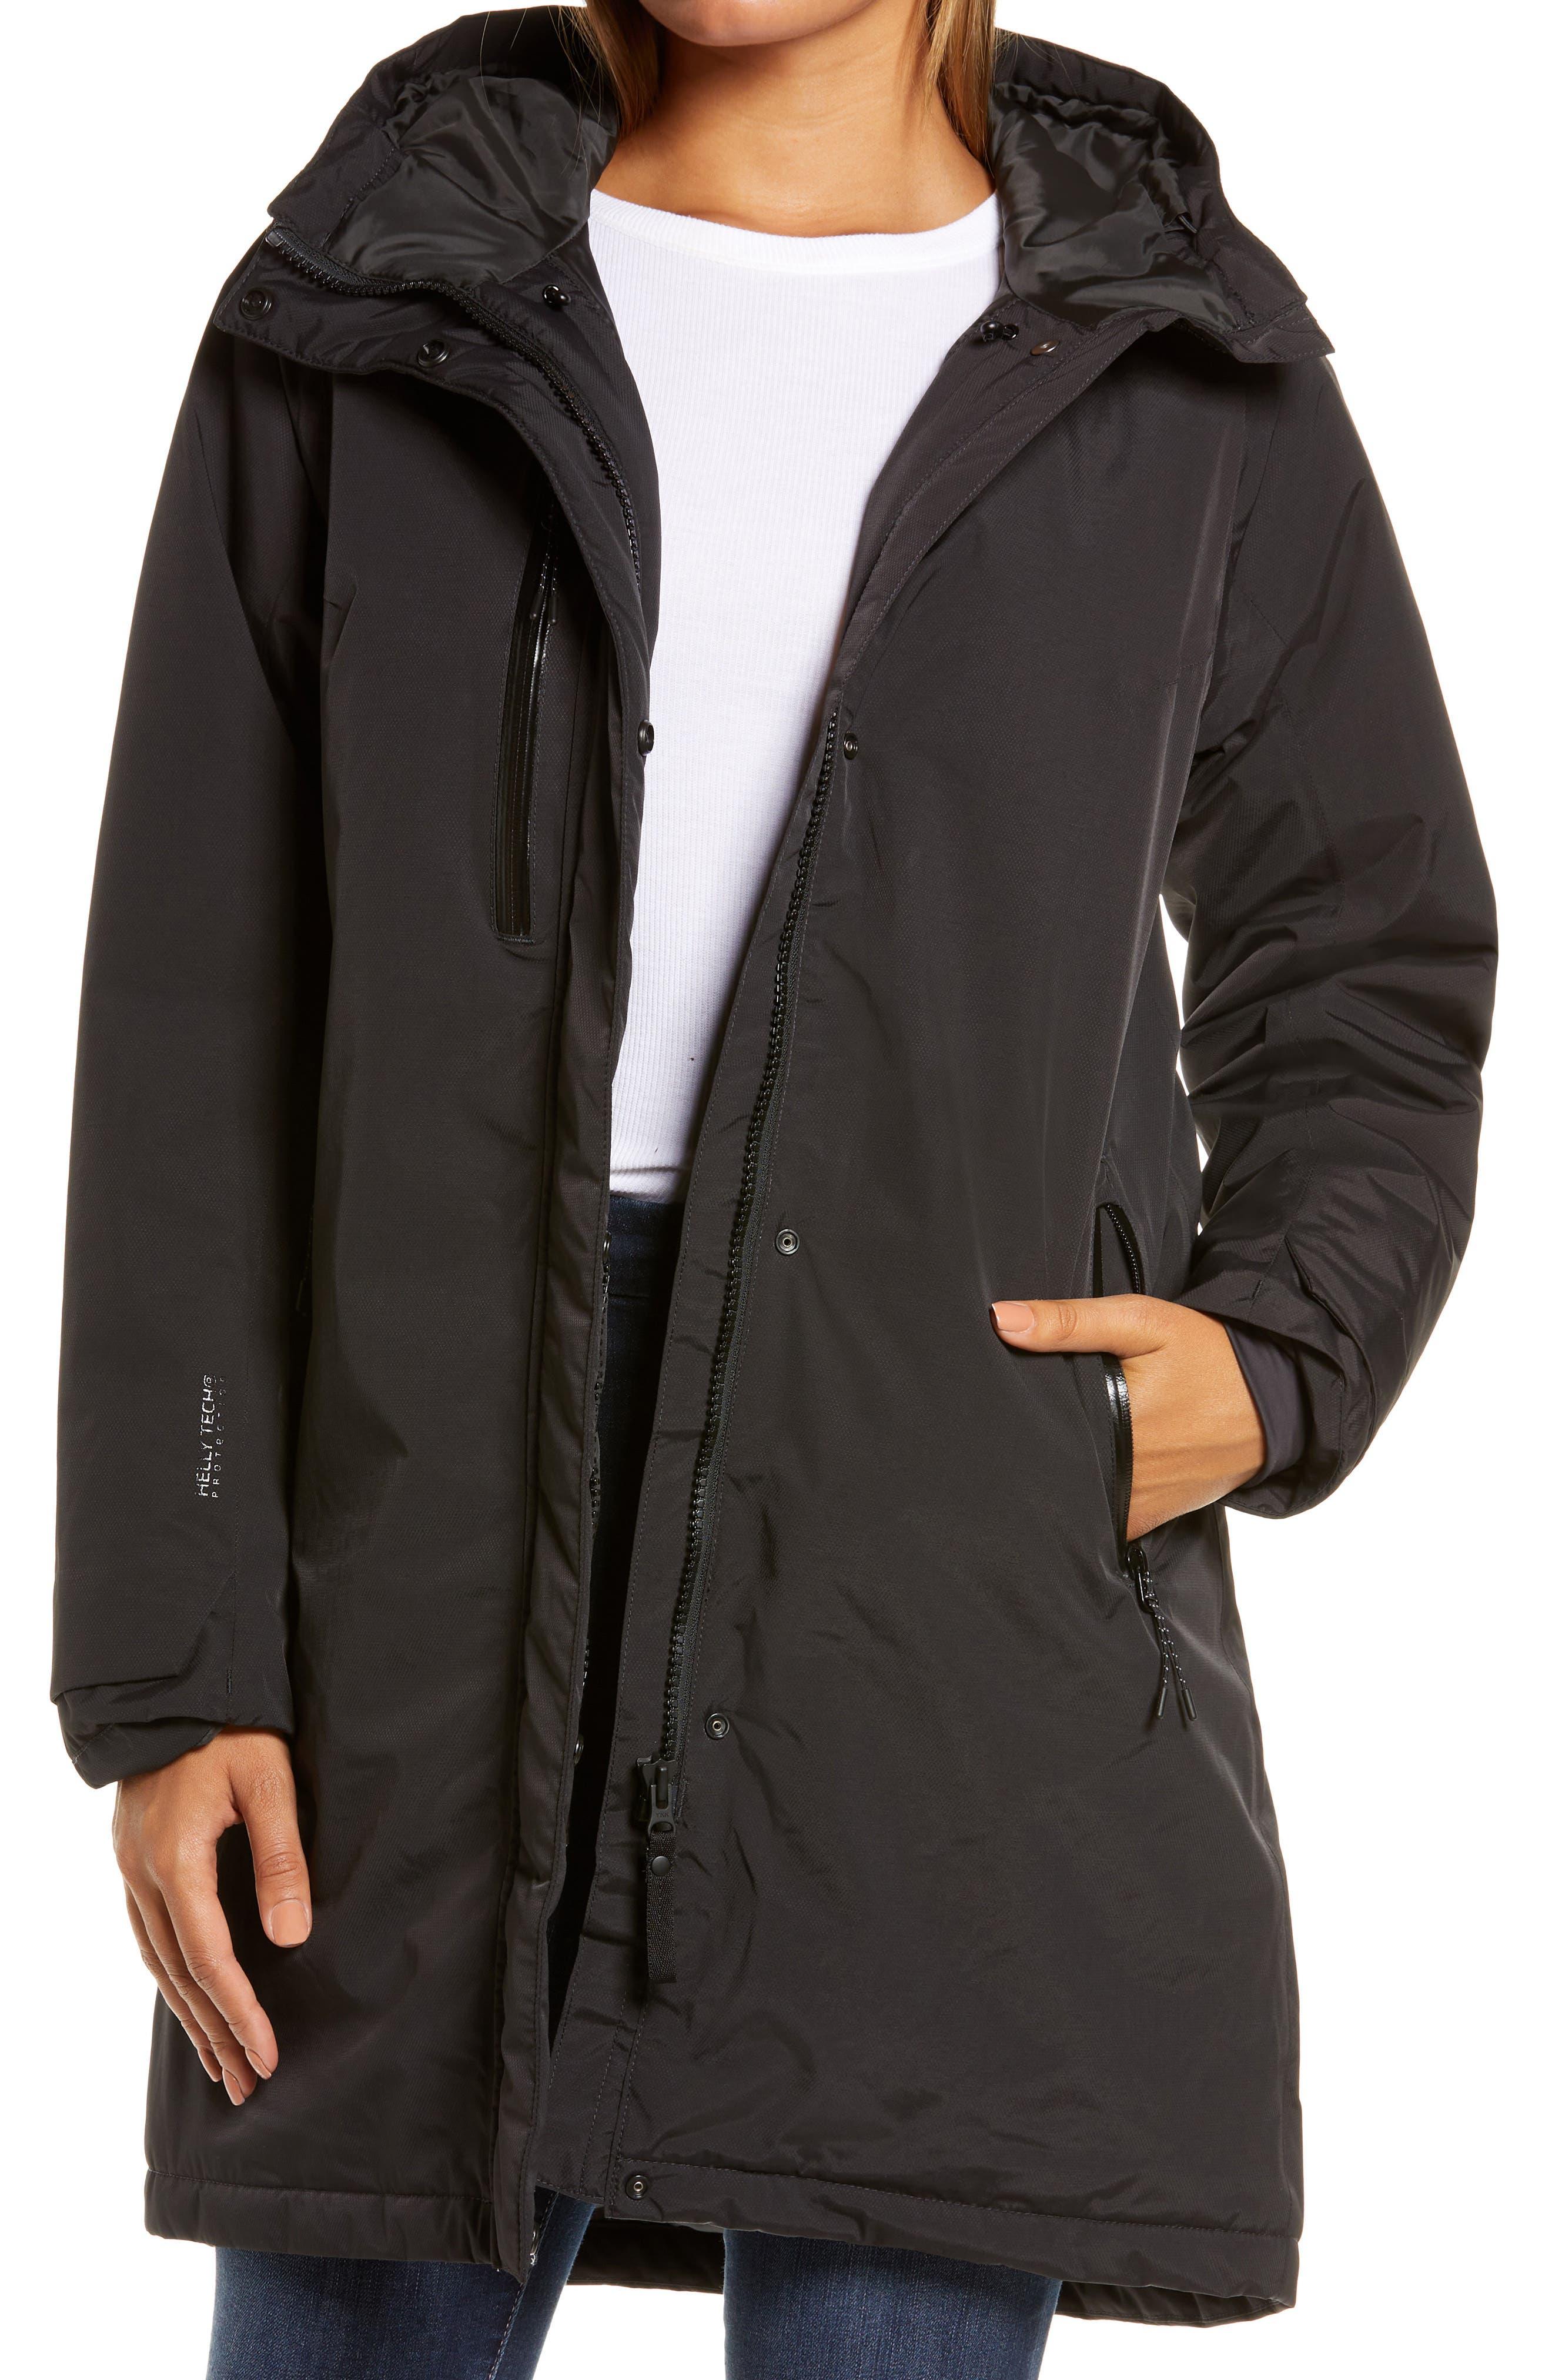 Adore Insulated Hooded Rain Coat